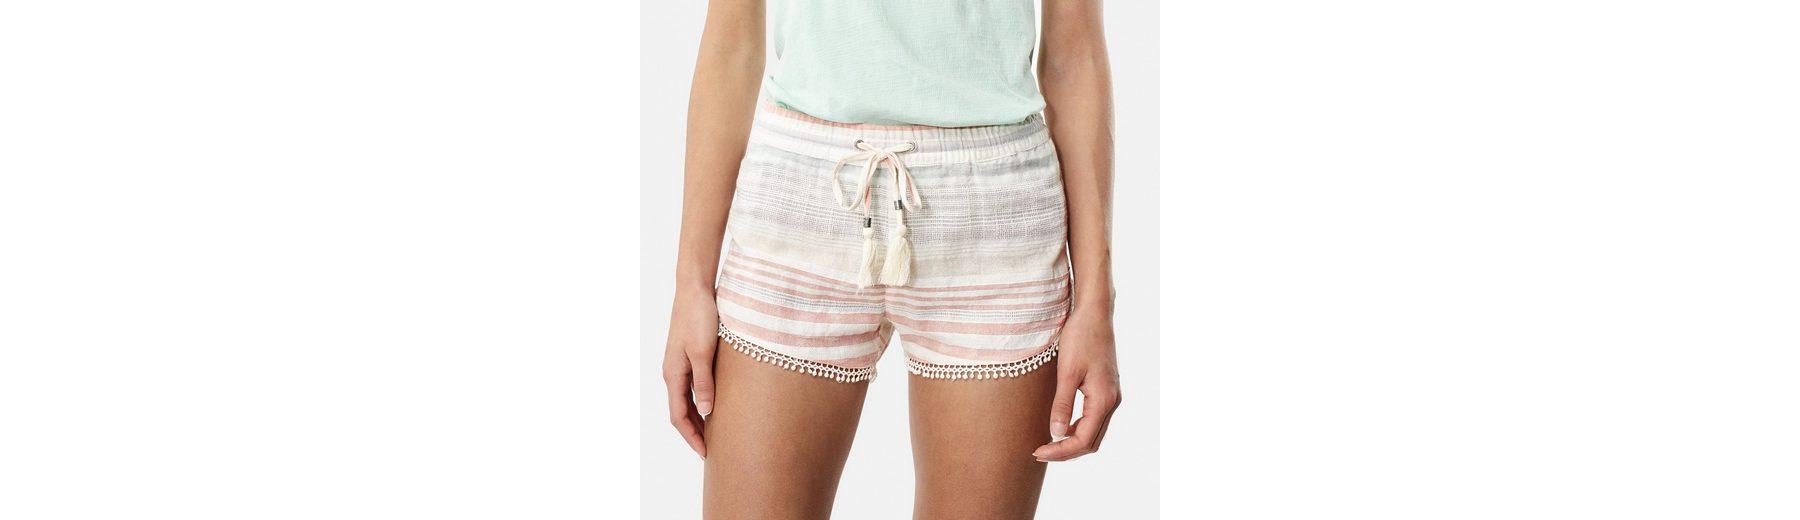 Perfekte Online-Verkauf O'Neill Shorts Jacquard lace detail Wo Kann Ich Bestellen Speichern Günstigen Preis Freies Verschiffen Nicekicks Auslassstellen Günstig Online j2gWv1Oa